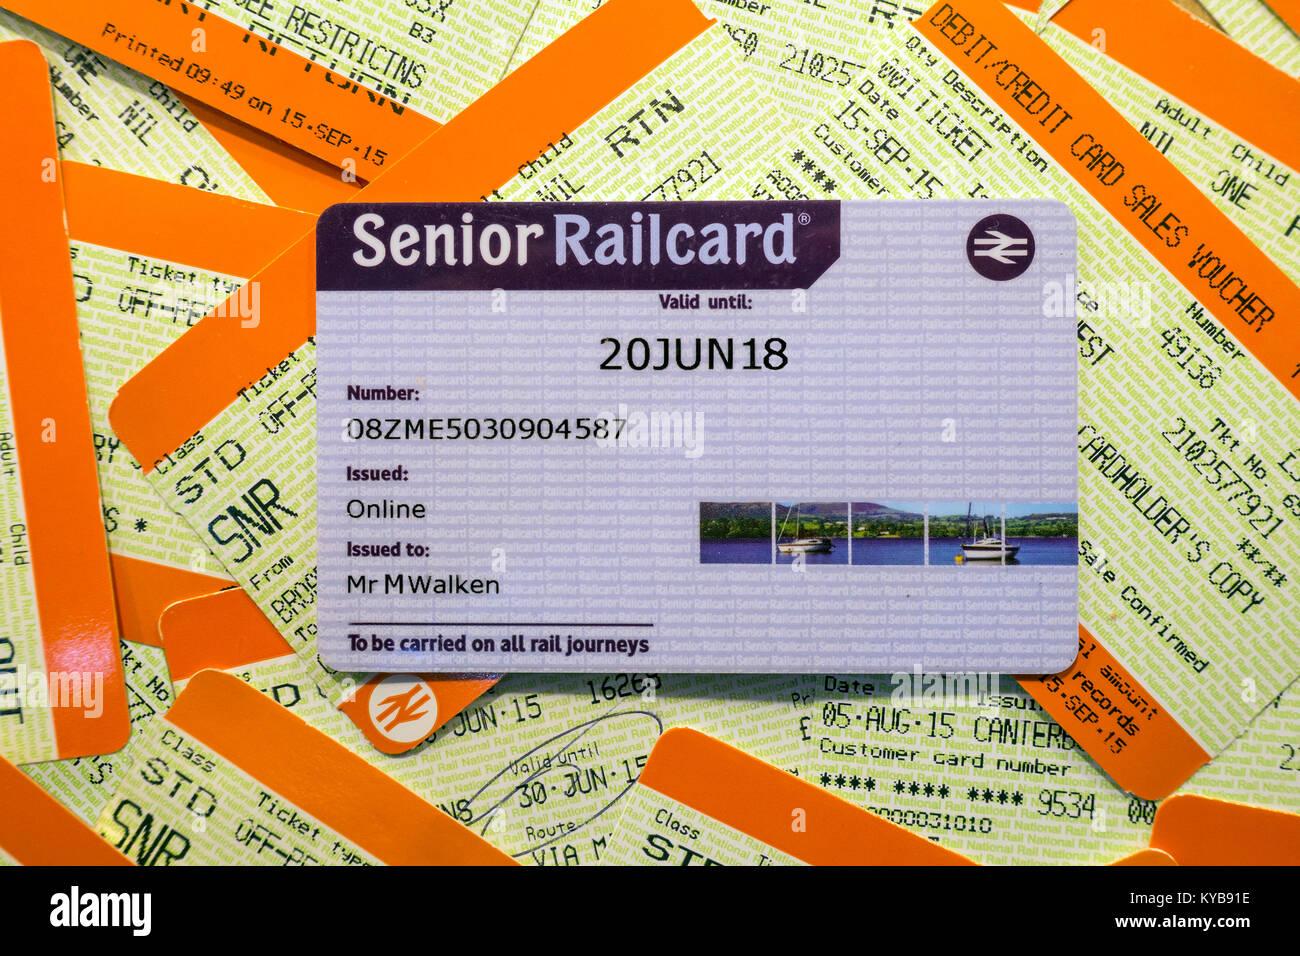 Peak Travel Card Cost